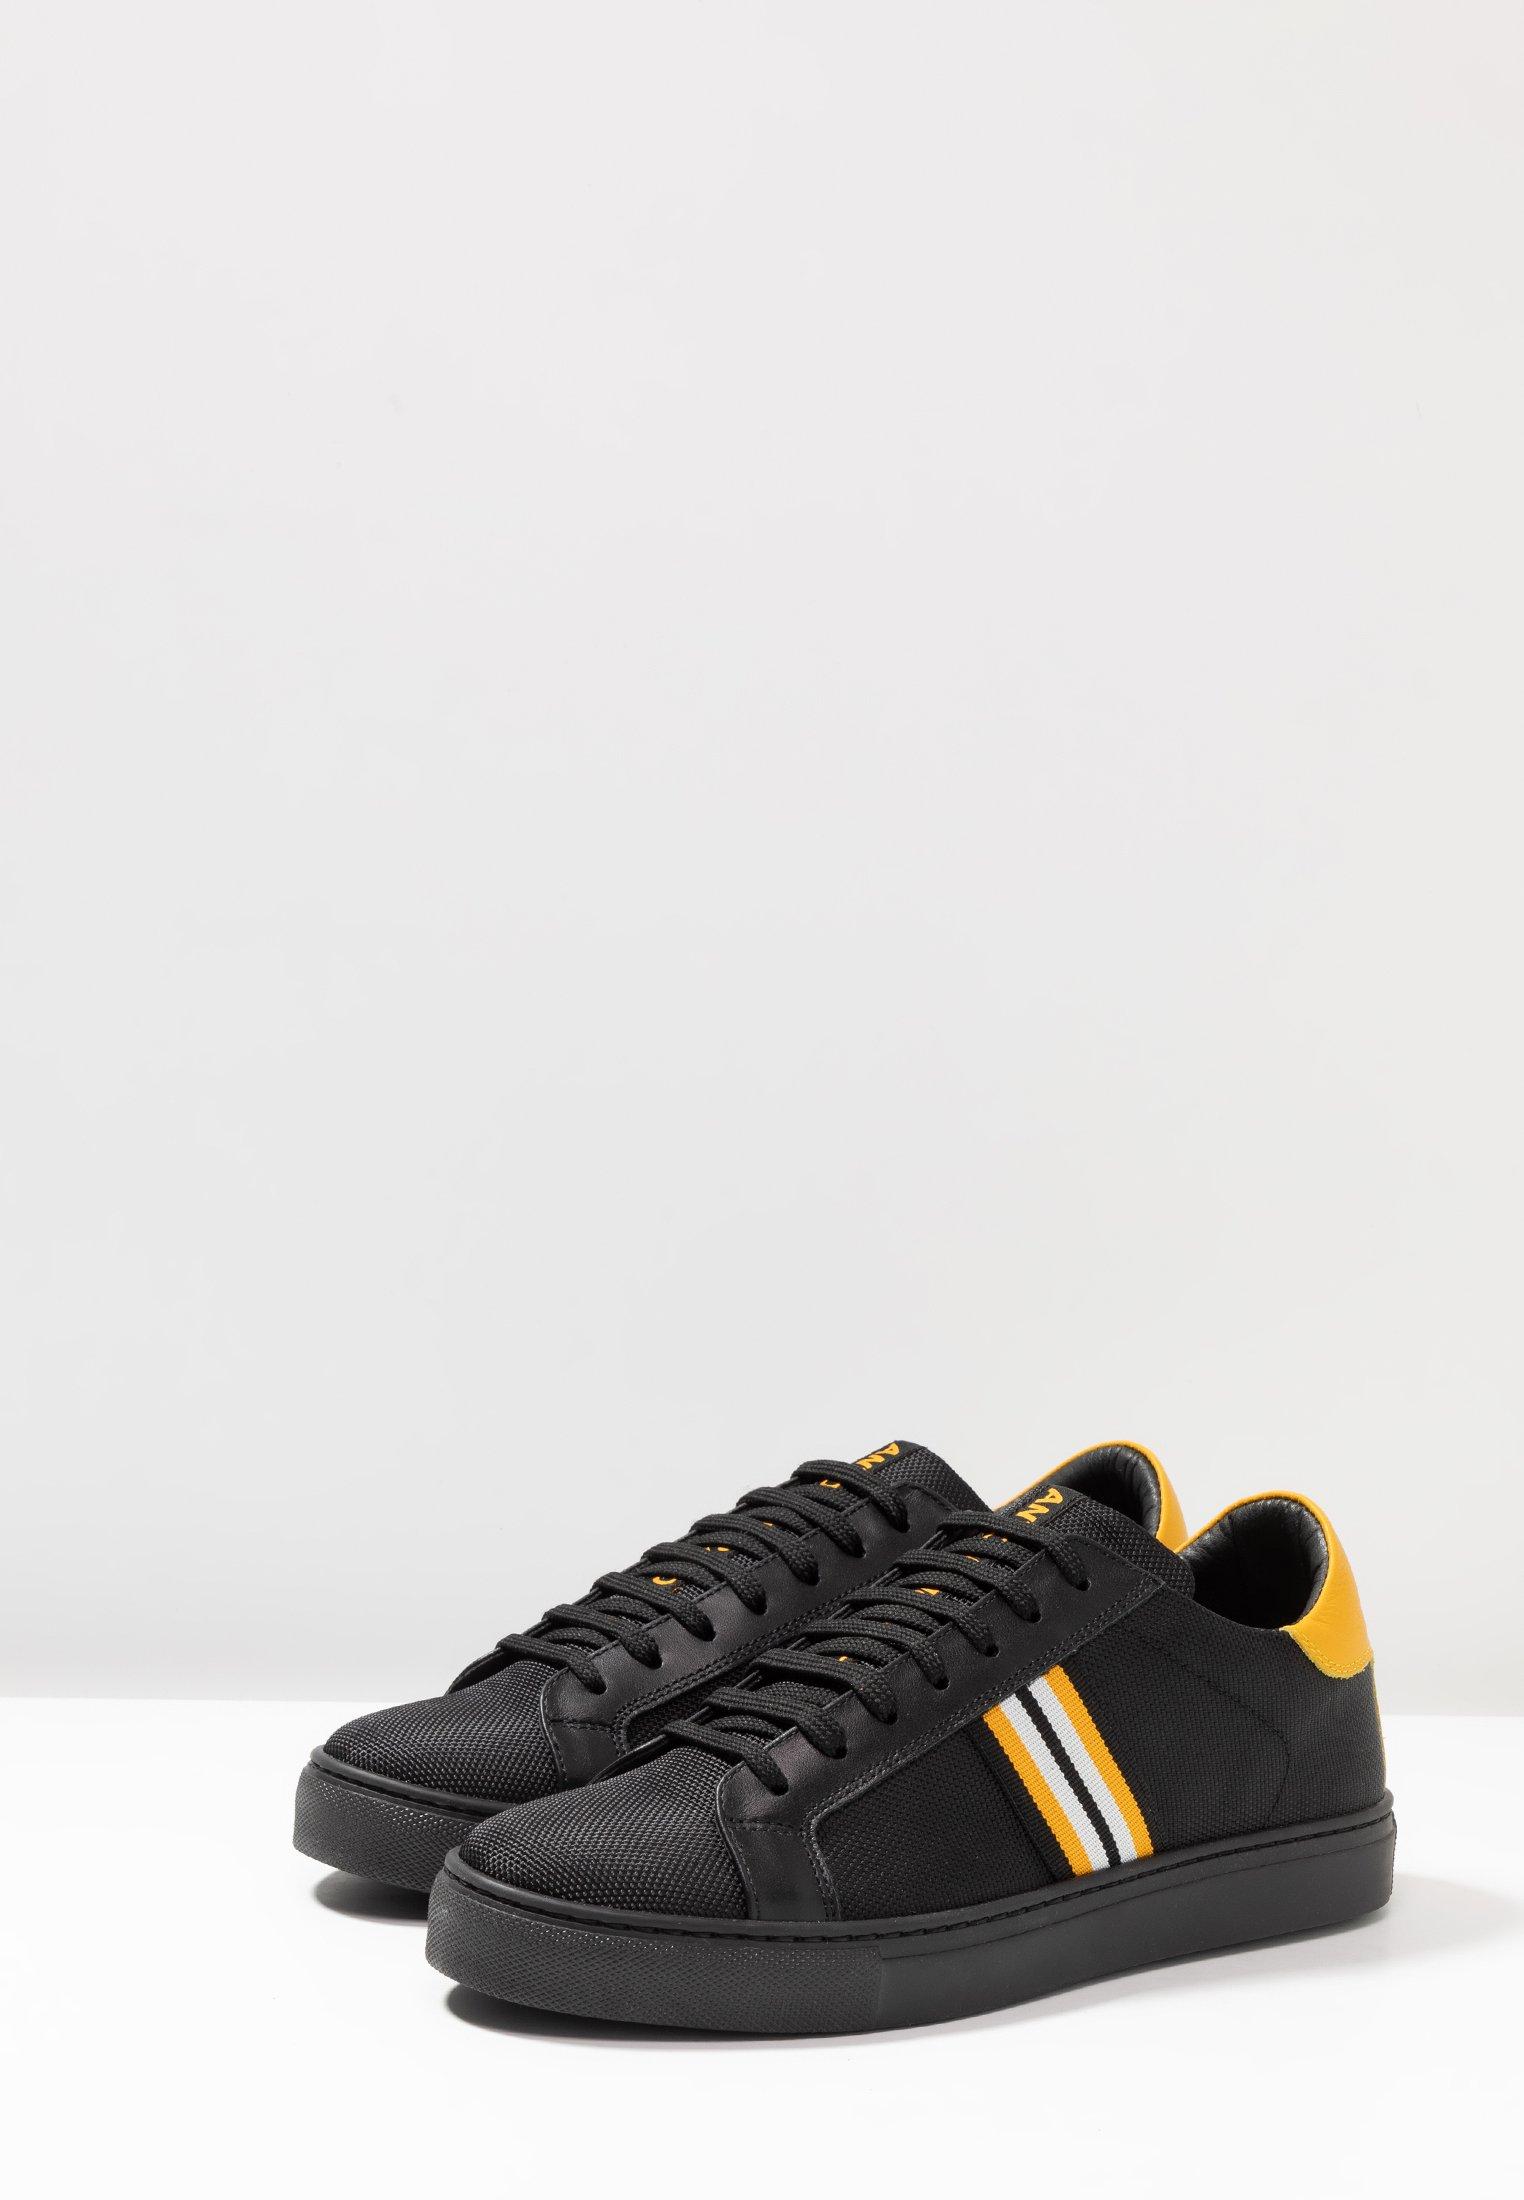 giallo Morato Basse Antony SkateSneakers Nero mgybf6YvI7